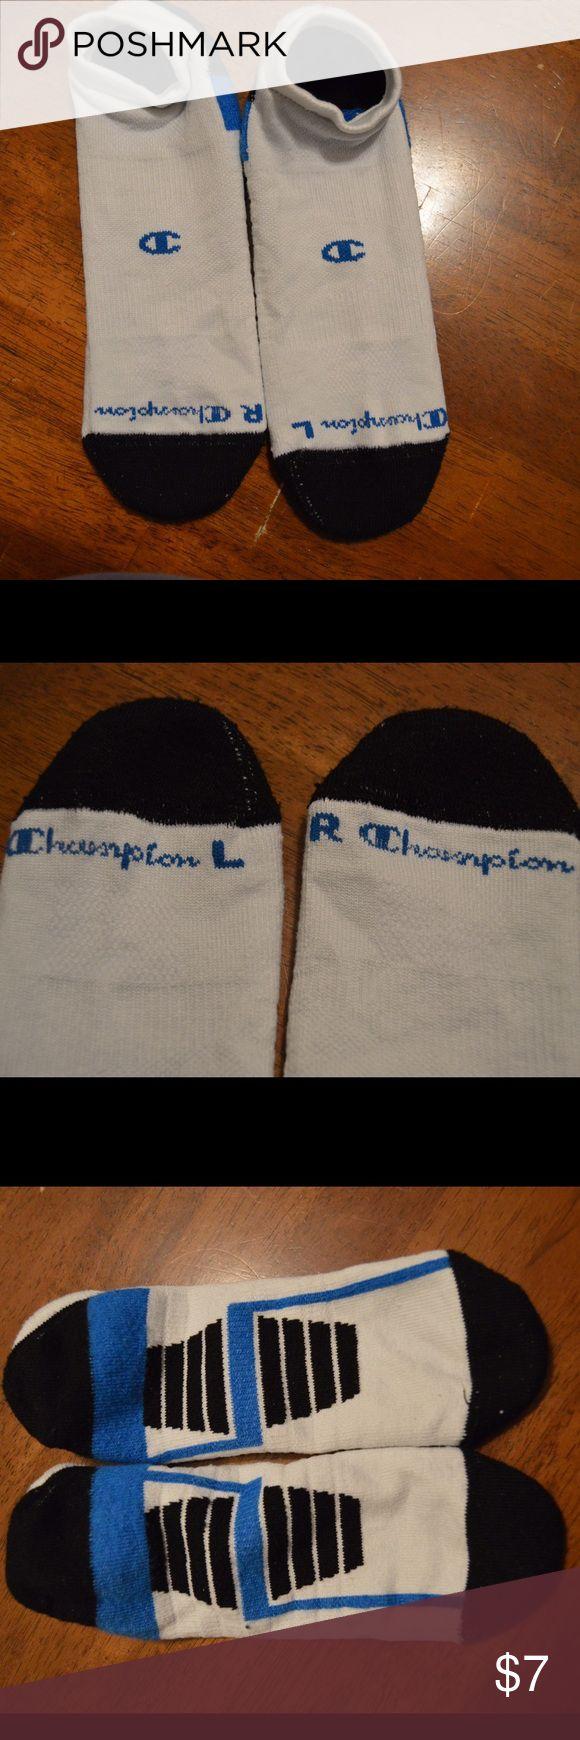 Champion men's socks Like new men's champion socks. 1 pair. White, black, and blue. Hardly worn Champion Accessories Hosiery & Socks